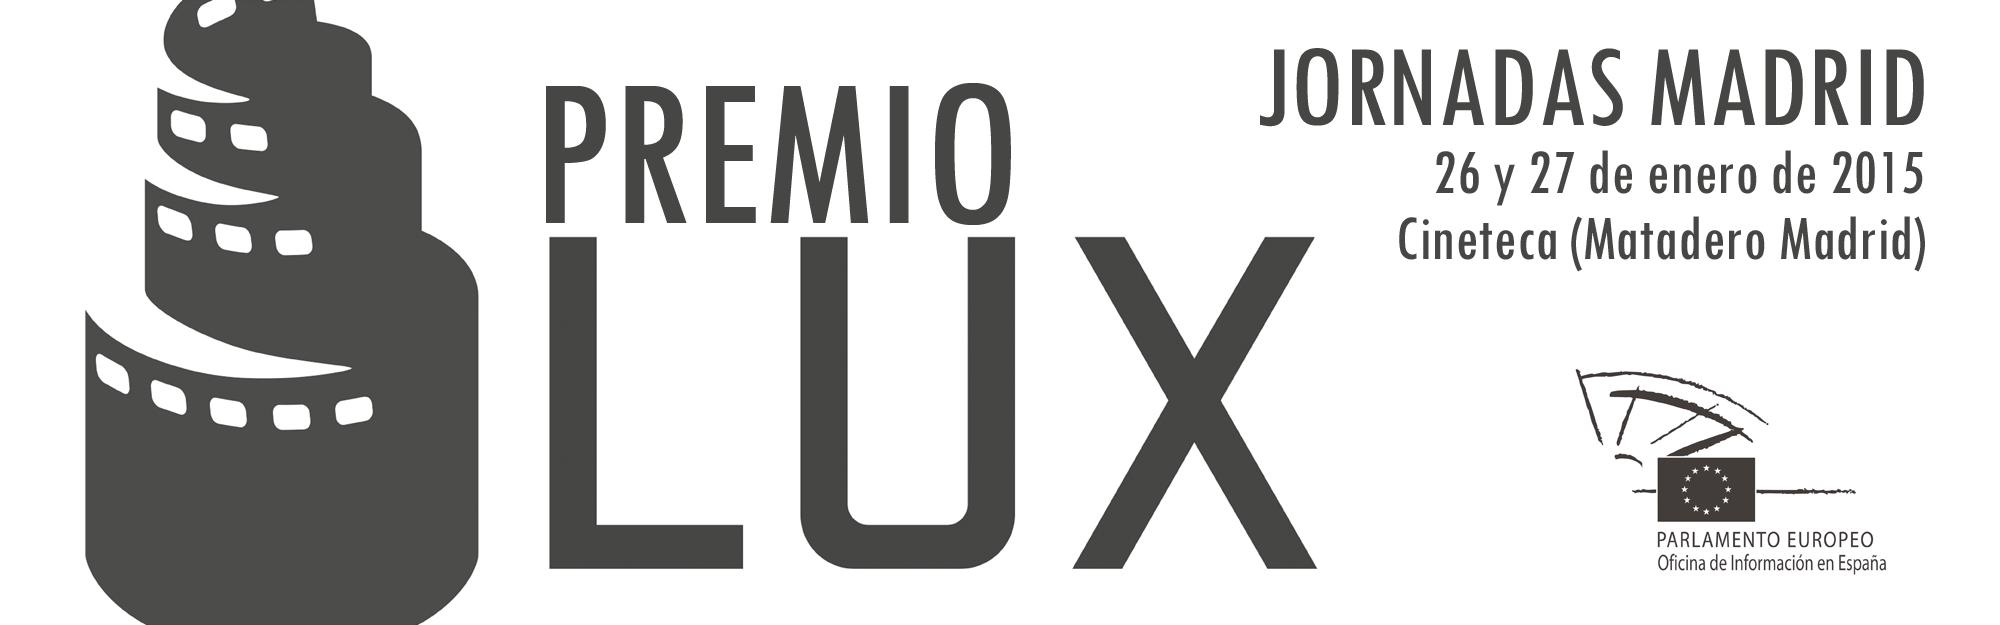 banner premios lu